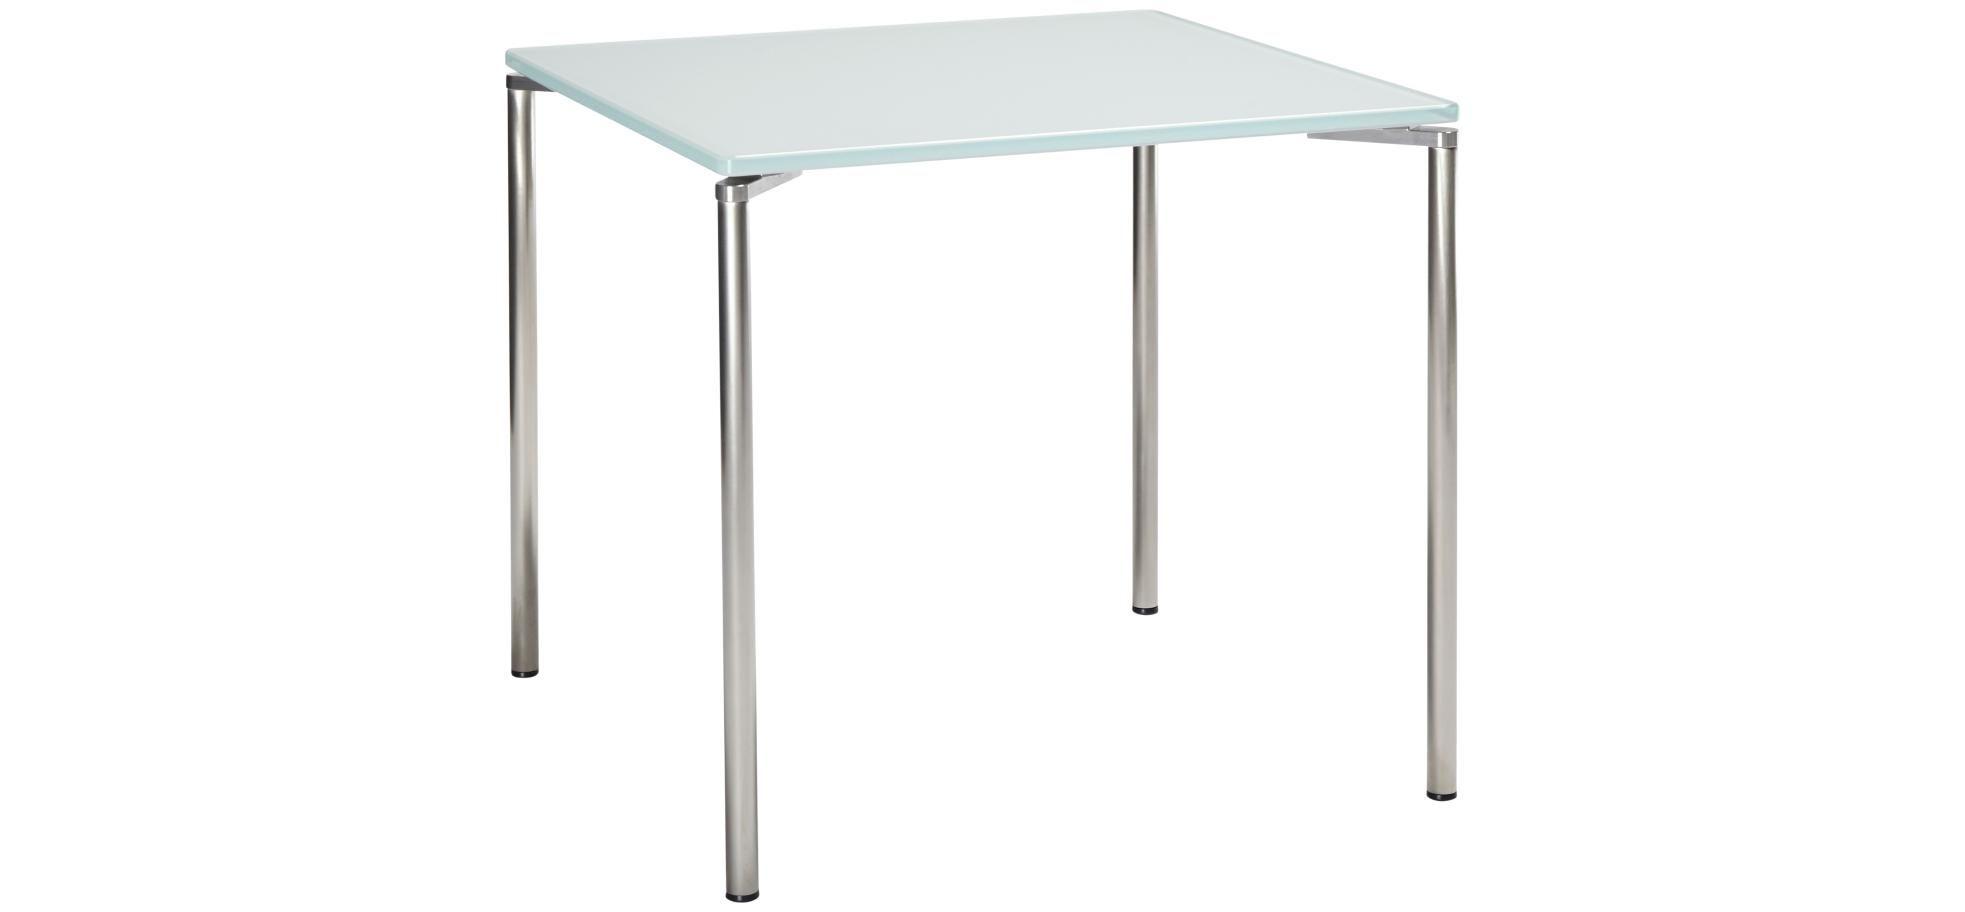 Couchtisch Quadratisch Global Cambra Mit Glasplatte Berkemeier Home Company Couchtisch Quadratisch Haus Deko Tisch